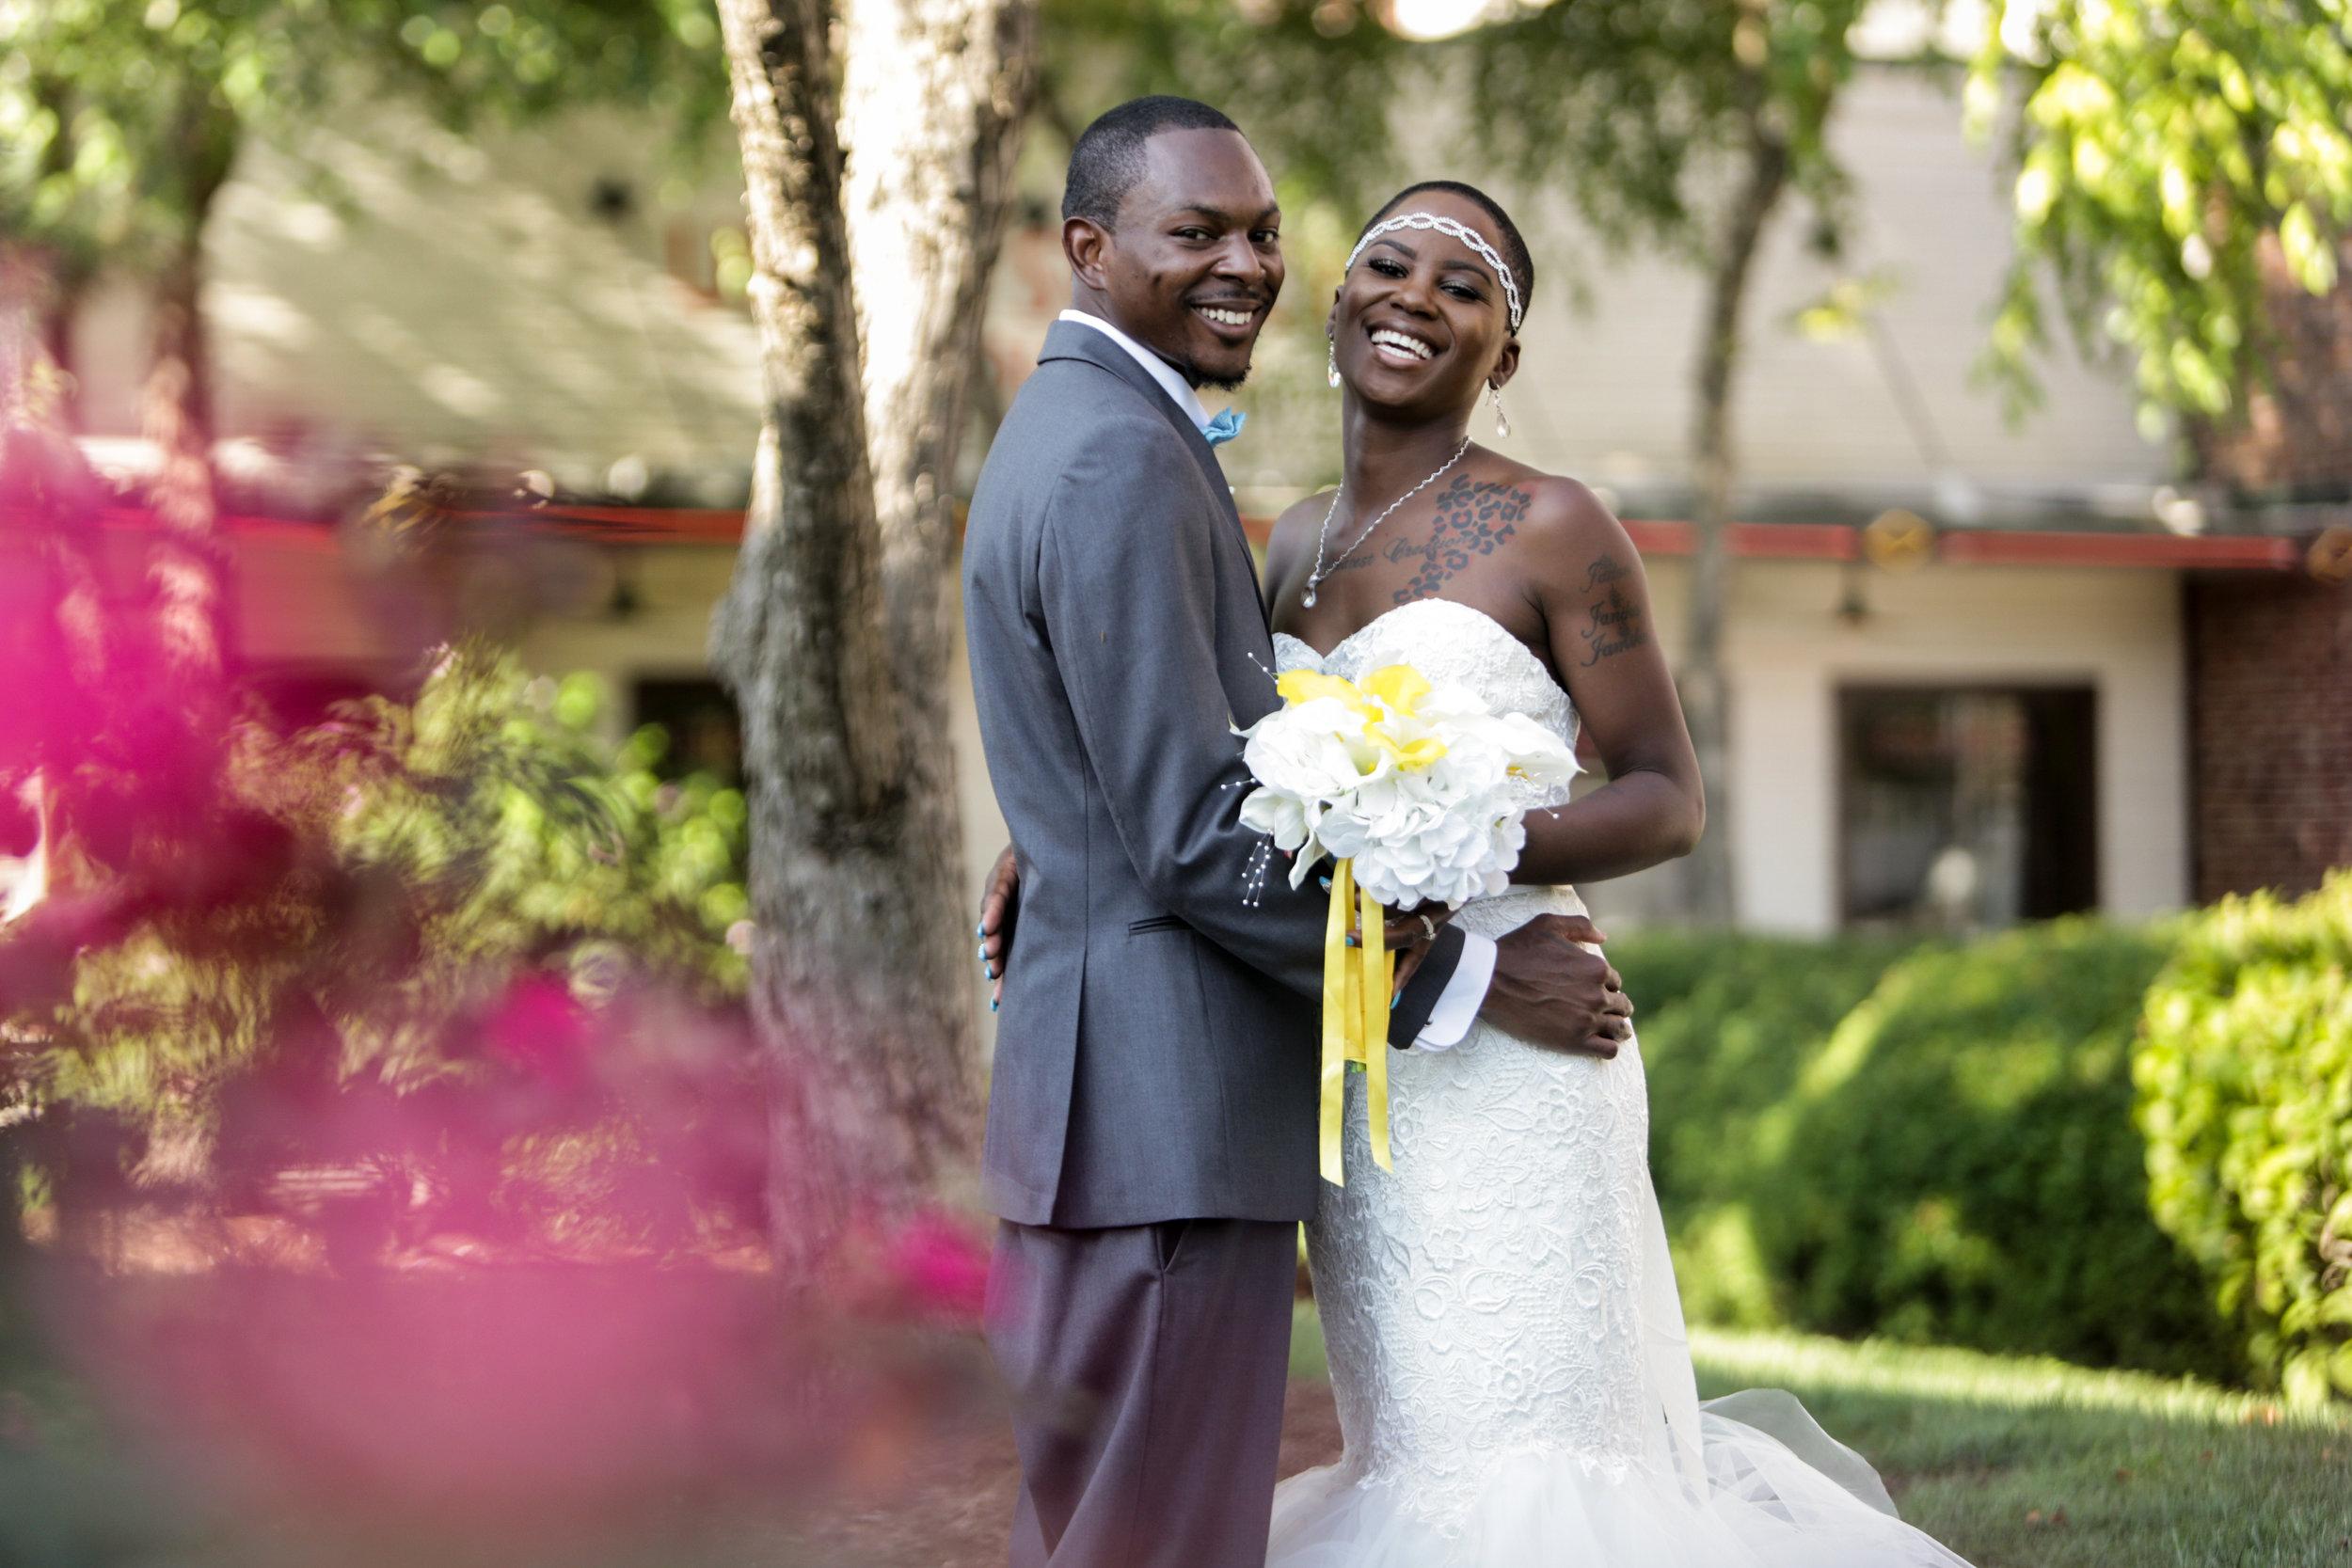 St. Louis Photographer St. Charles Photographer Engagement Wedding Photographer (34).jpg